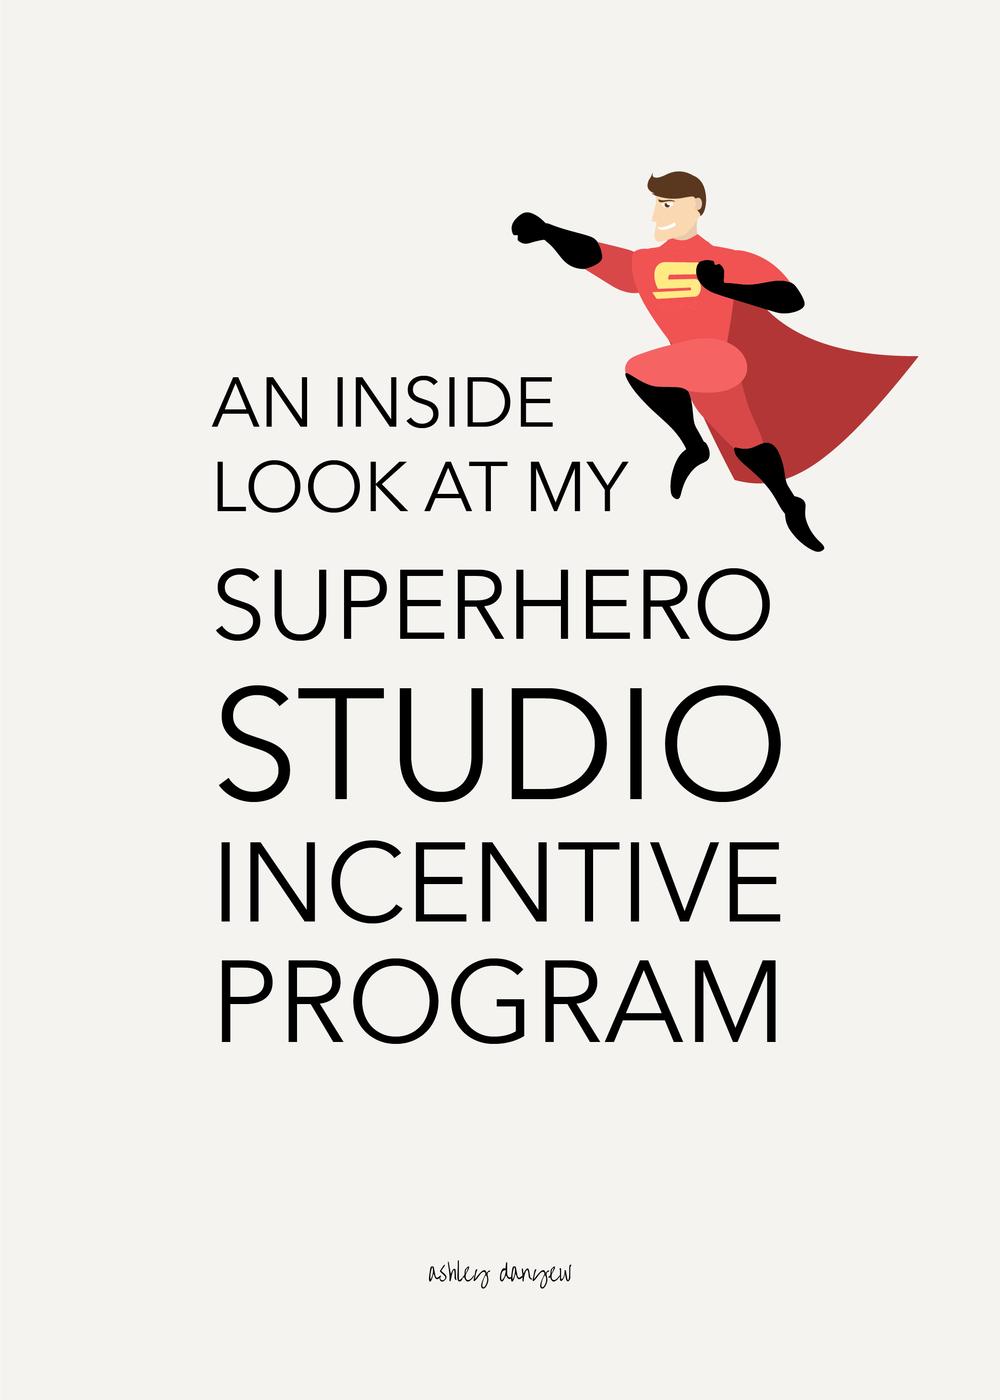 An Inside Look at My Superhero Studio Incentive Program